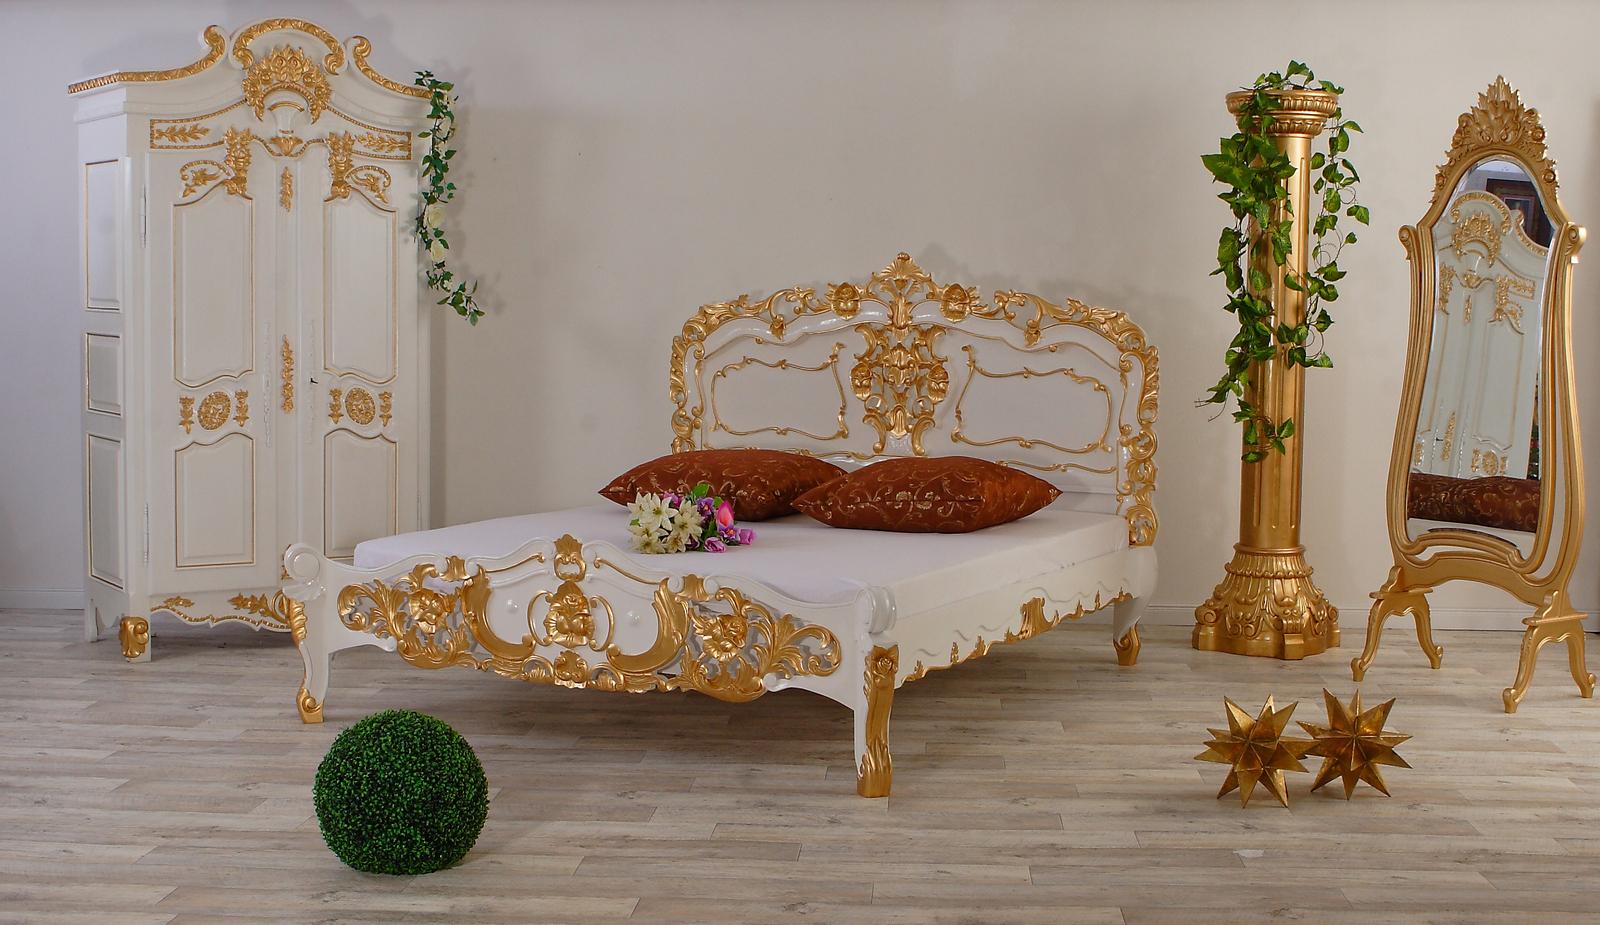 Luxus Rokoko Bett Weiss-Gold